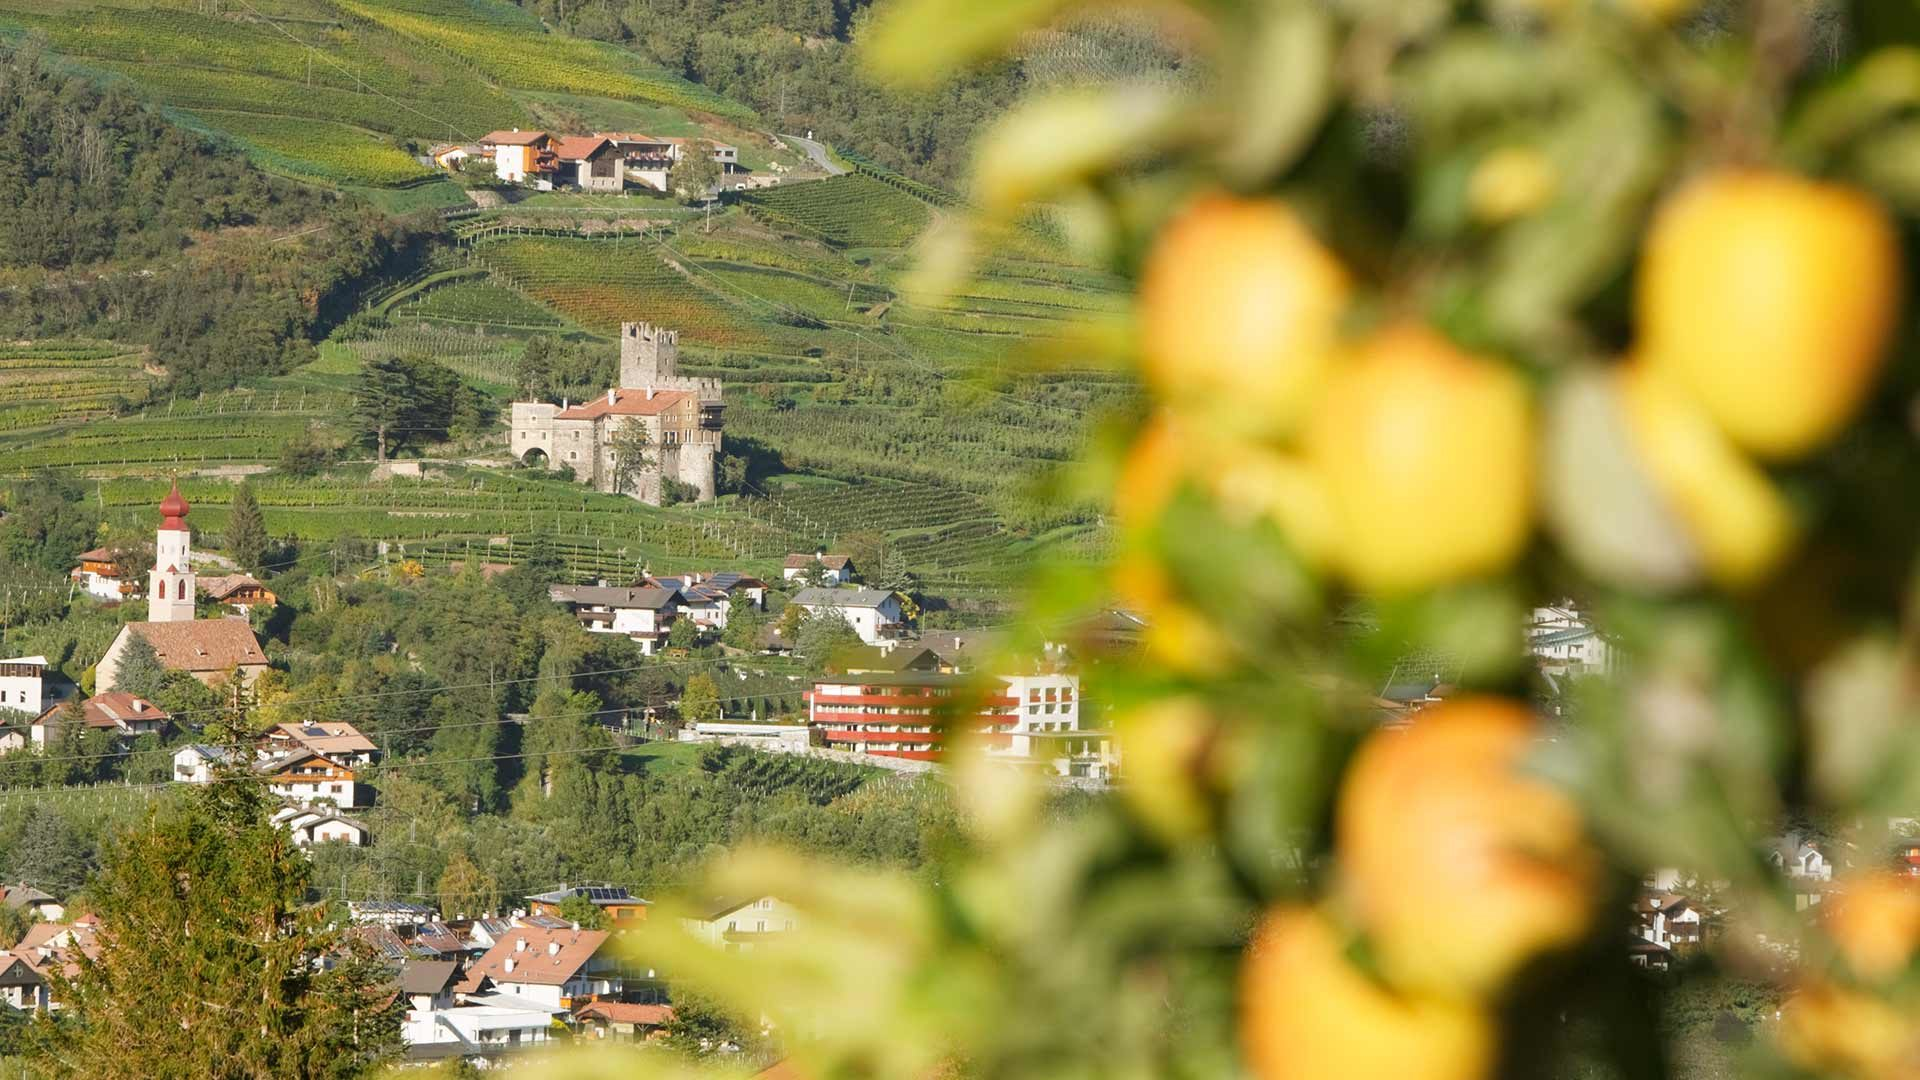 Alpine-Wellness-Ferienort Naturns